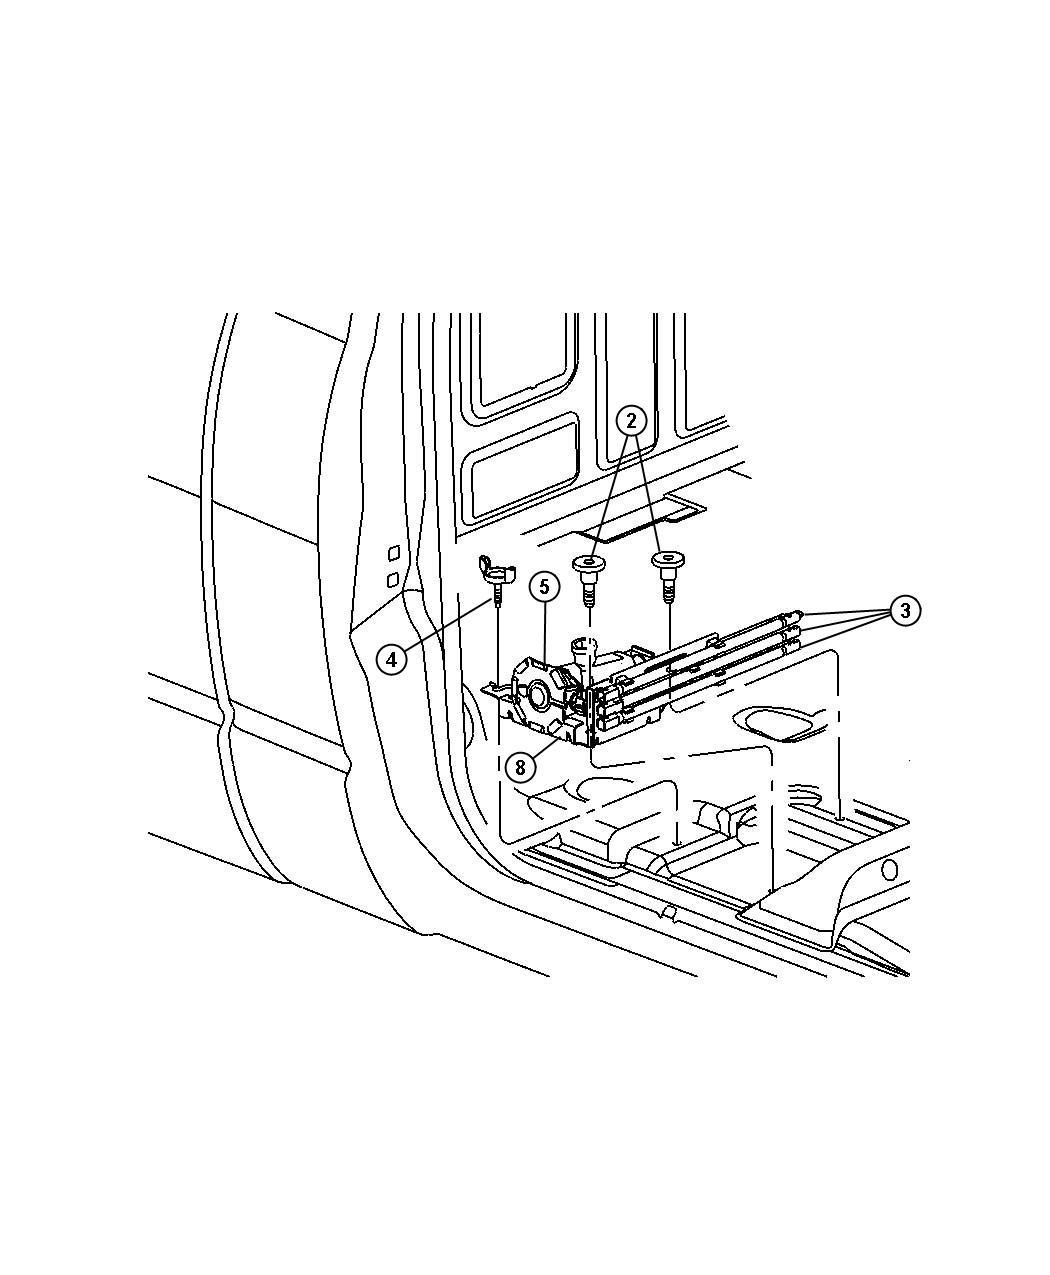 Dodge Ram 1500 Bag. Jack tool storage. Scissor